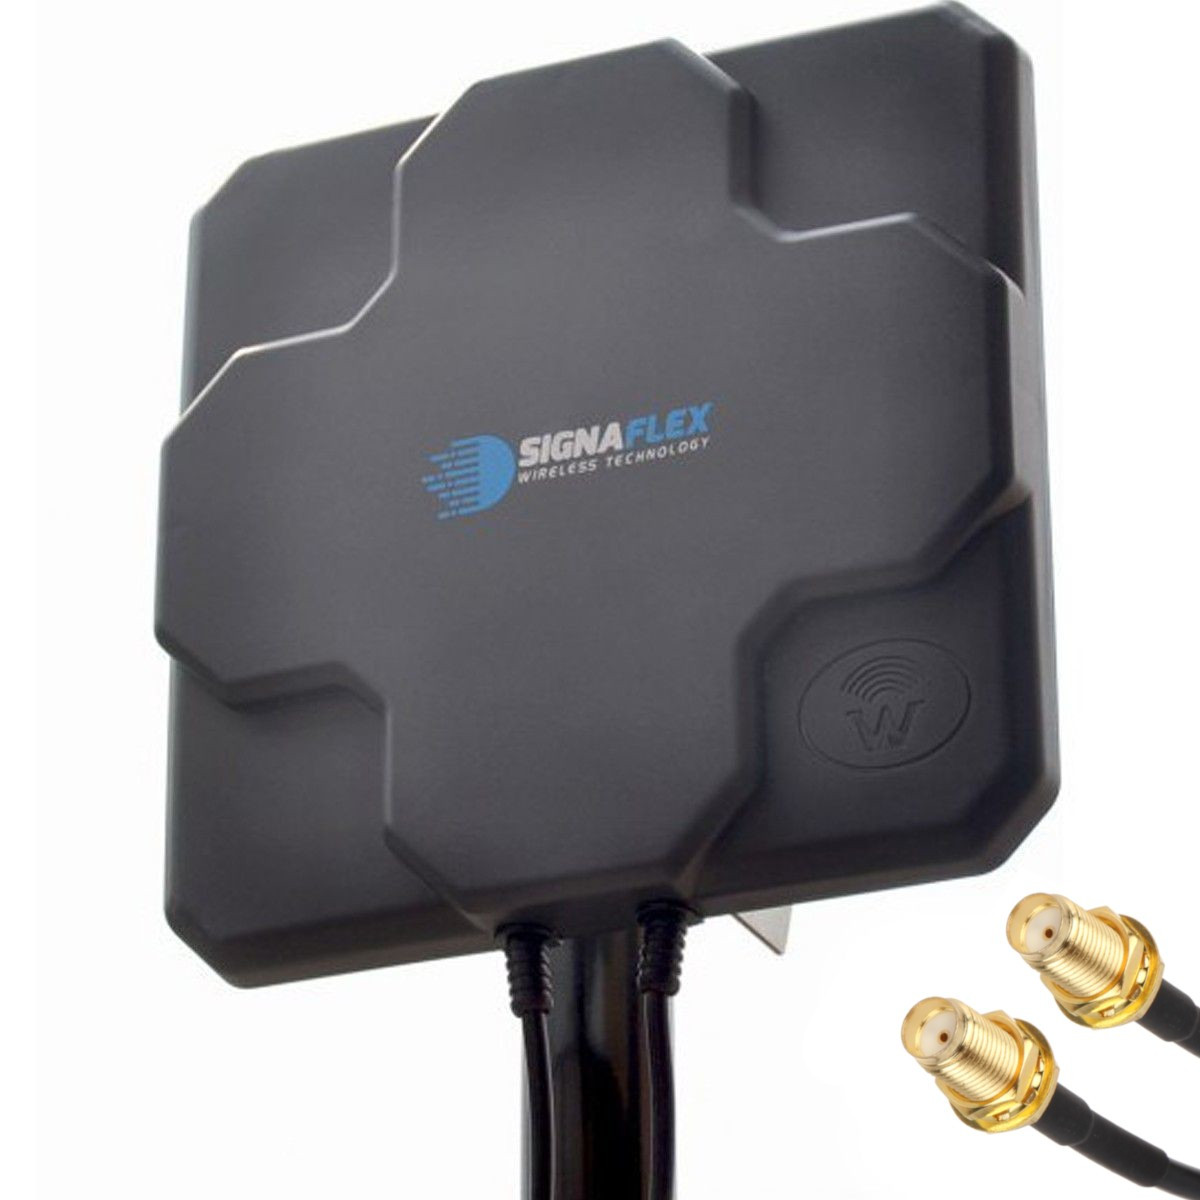 DUŻA Antena X-CROSS DUAL 2x 22dbi 4G LTE 2x 10m 2x TS9 prosty